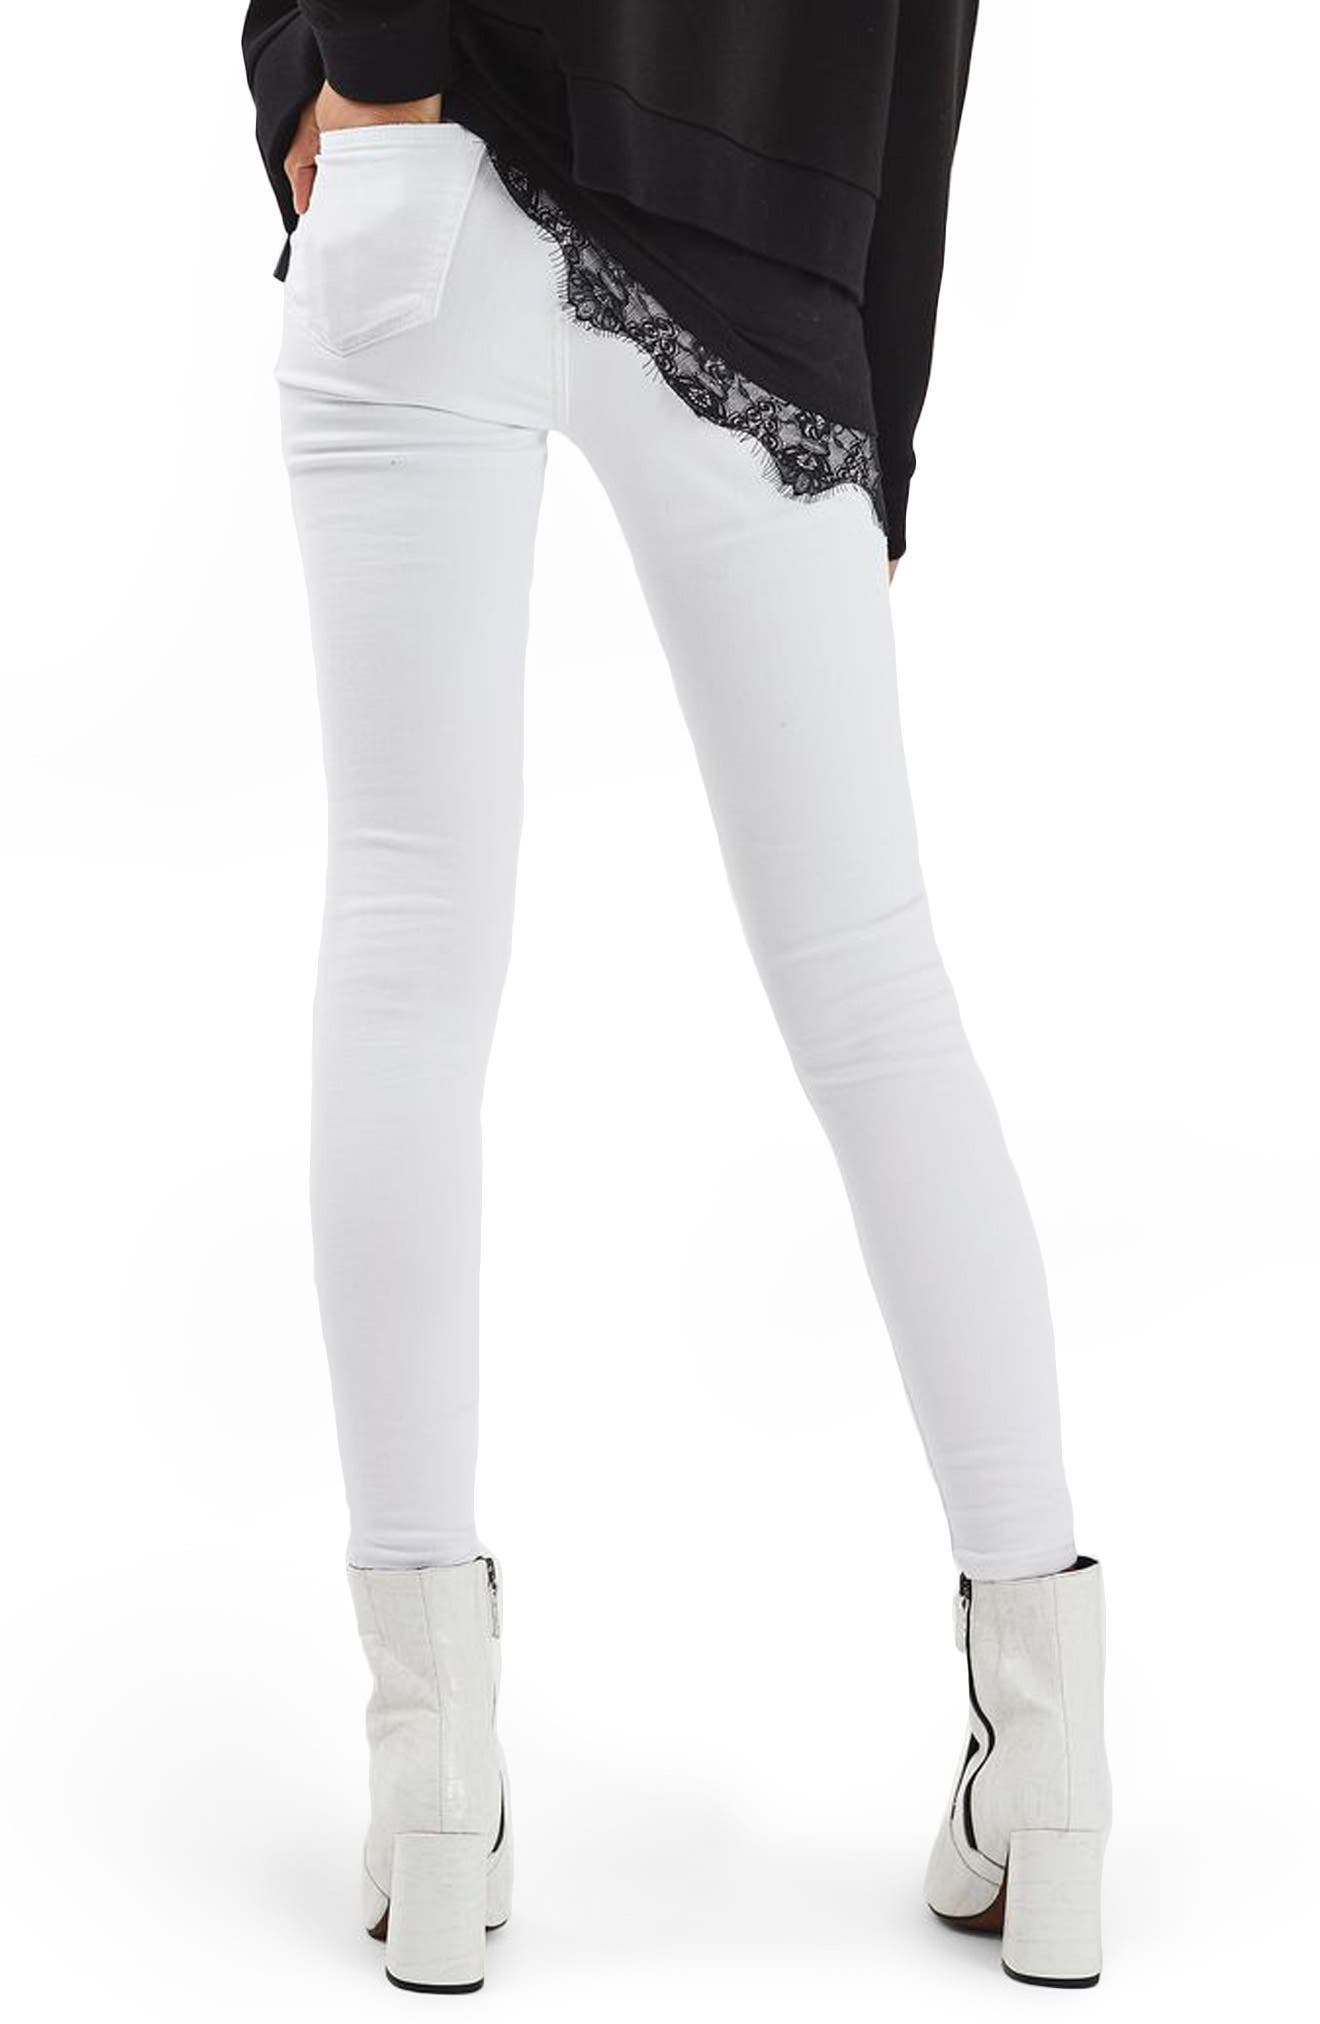 Jamie Ripped Skinny Jeans,                             Alternate thumbnail 3, color,                             White